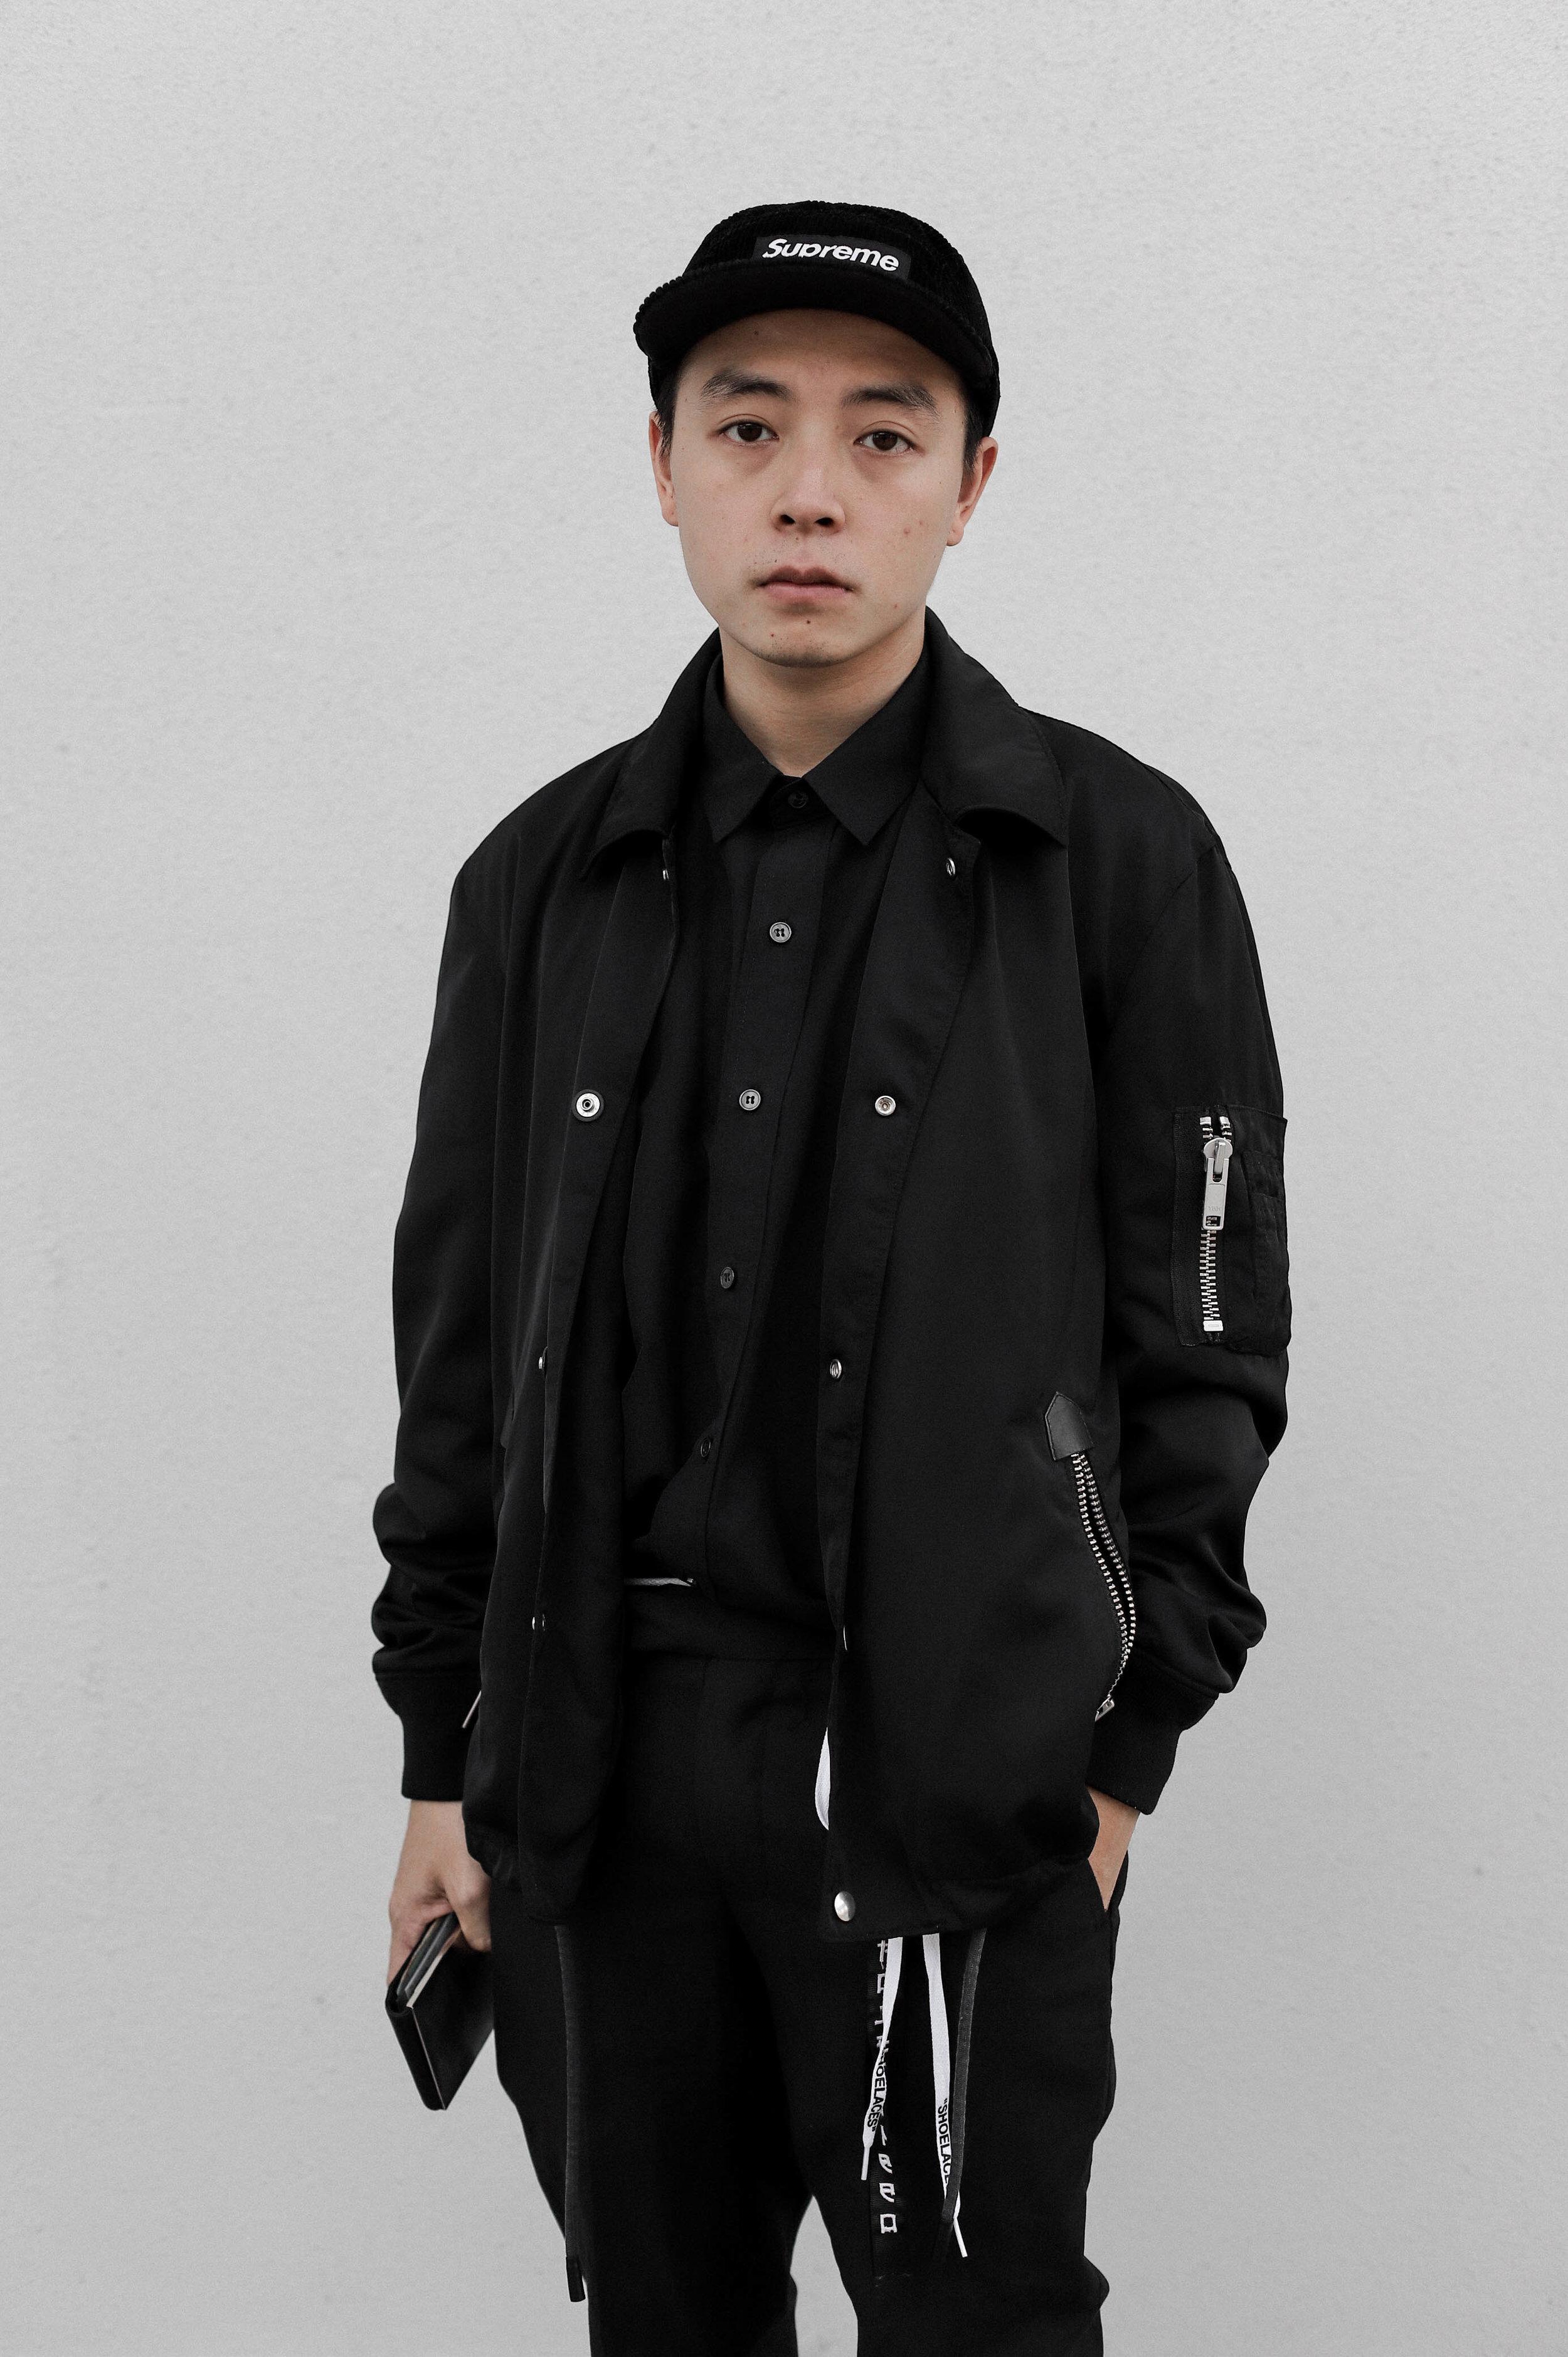 Dong Hoai Nam-6.jpg